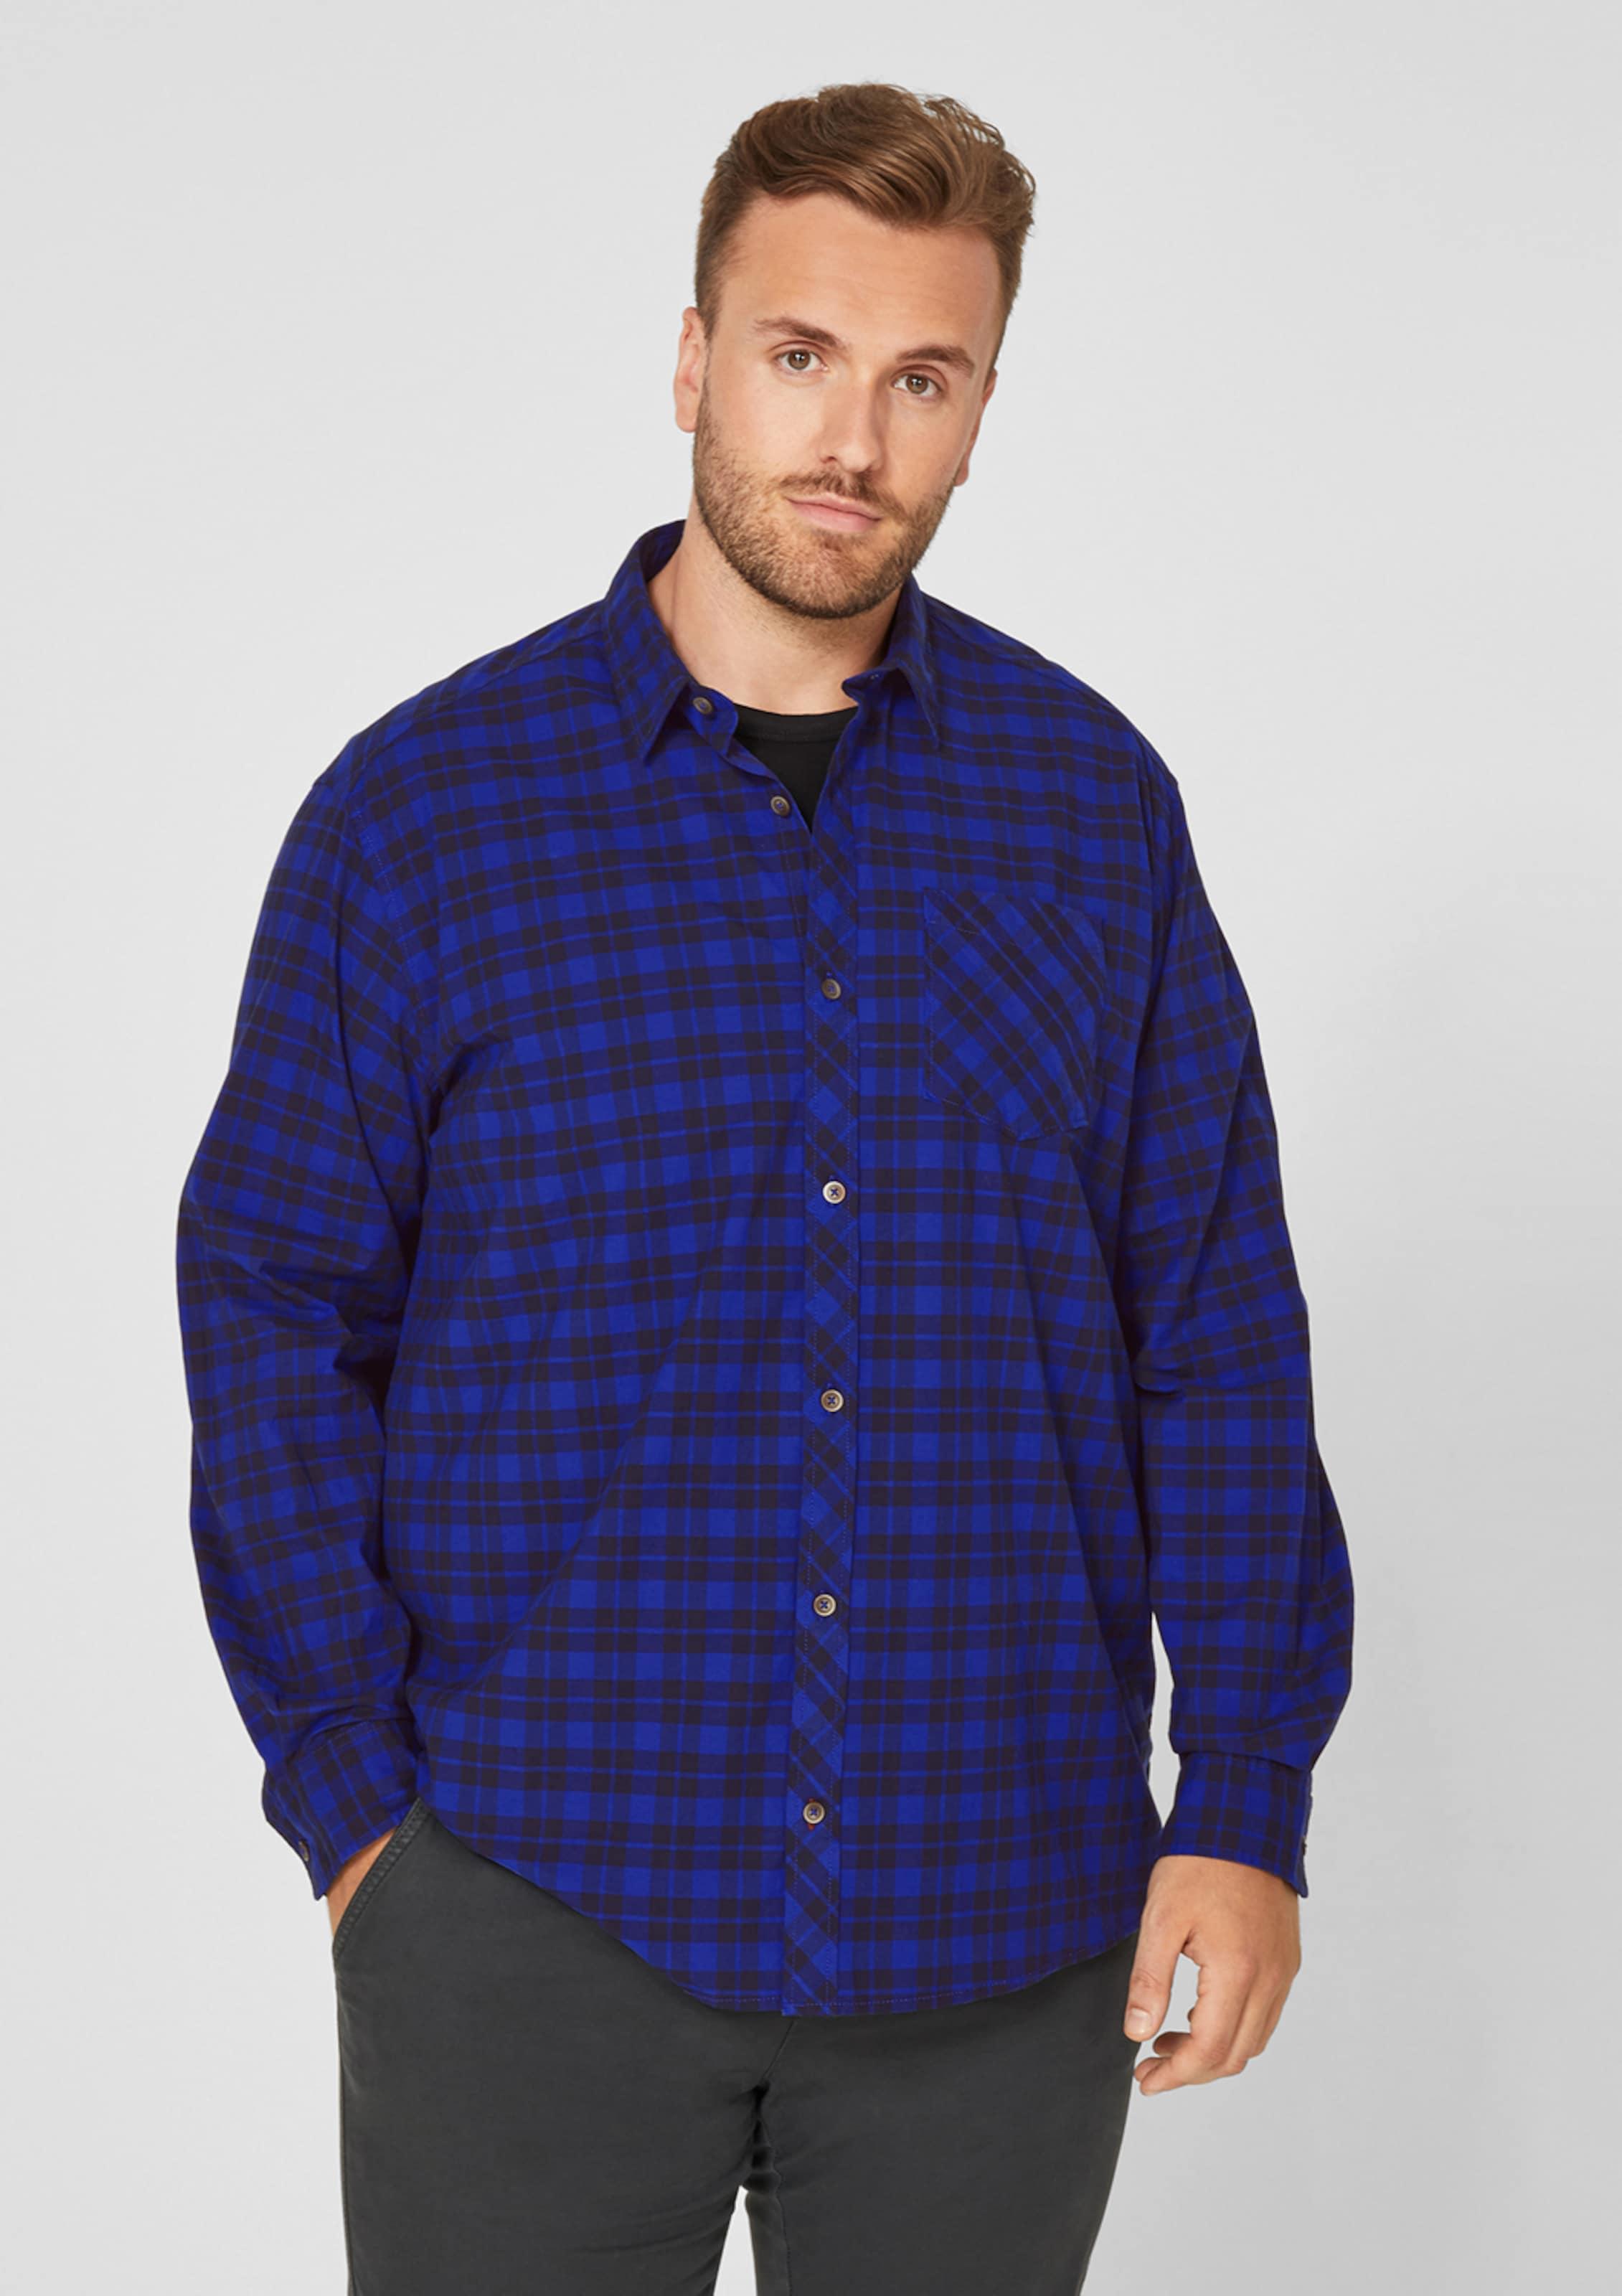 Label Red oliver Blau In Hemd S DeIWYE29bH